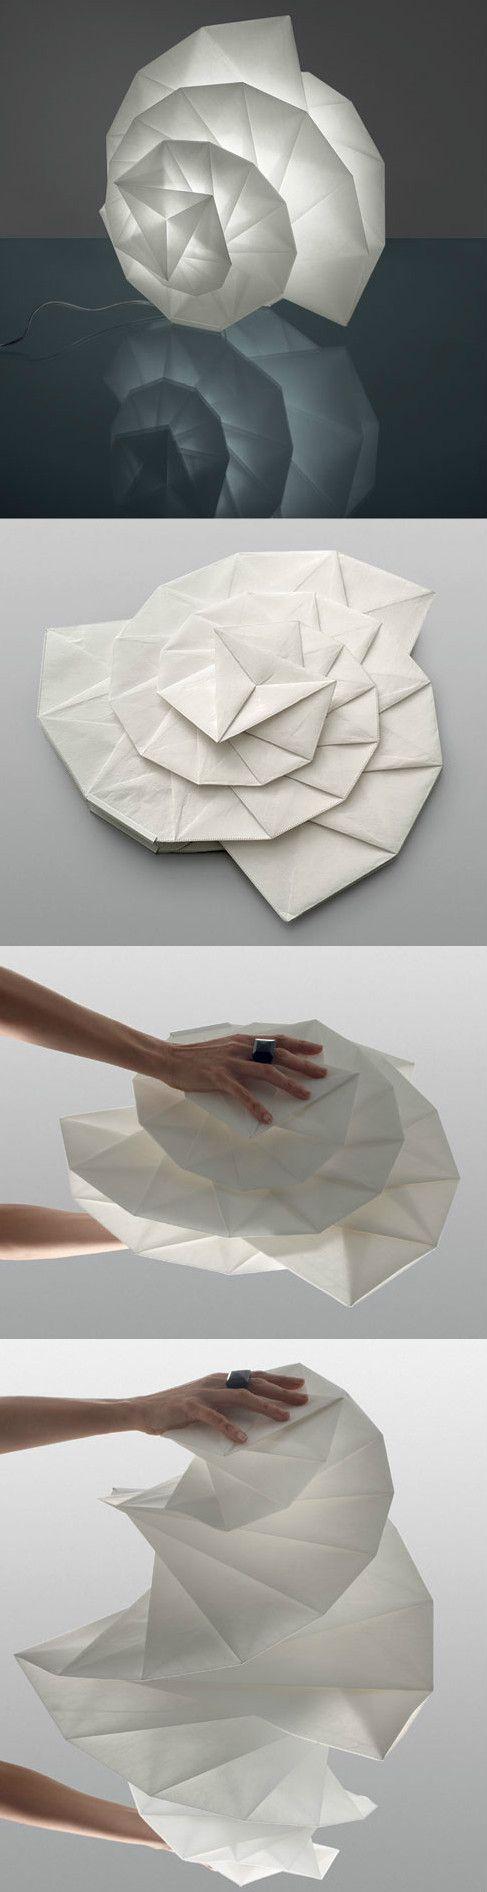 Origami lighting